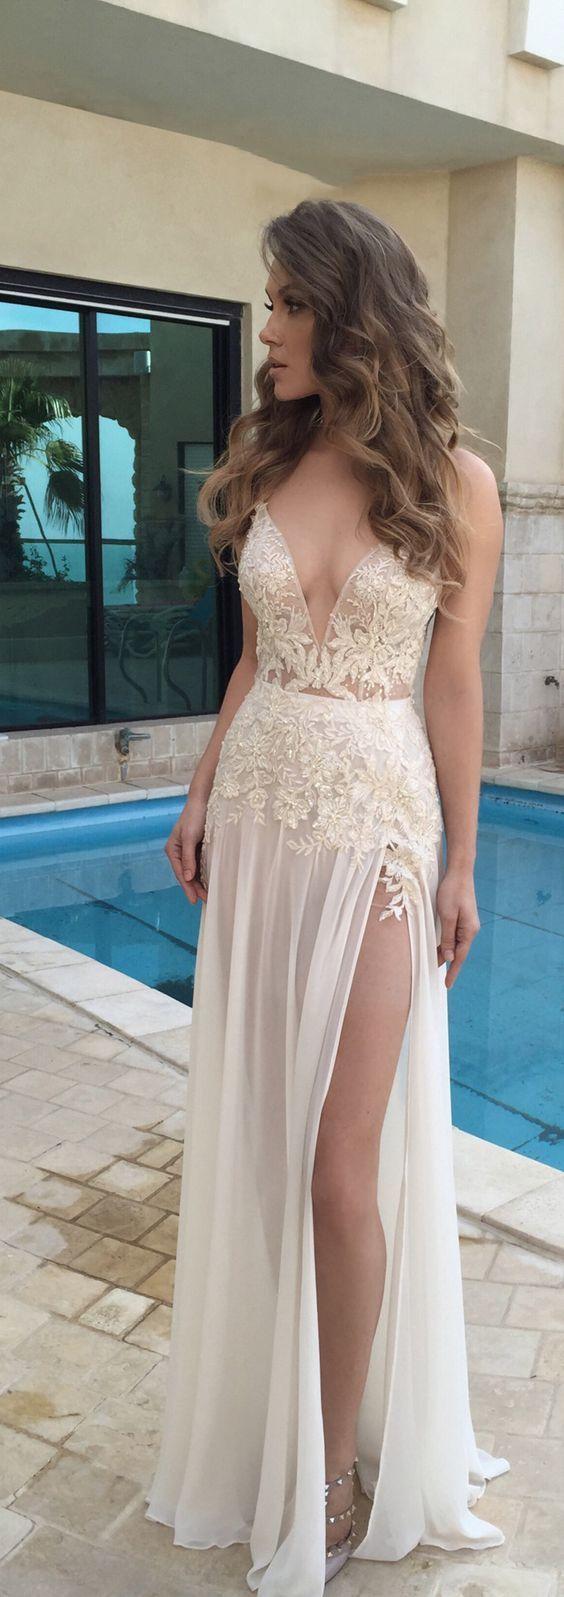 Gallery: Berta Bridal wedding dresses 2016